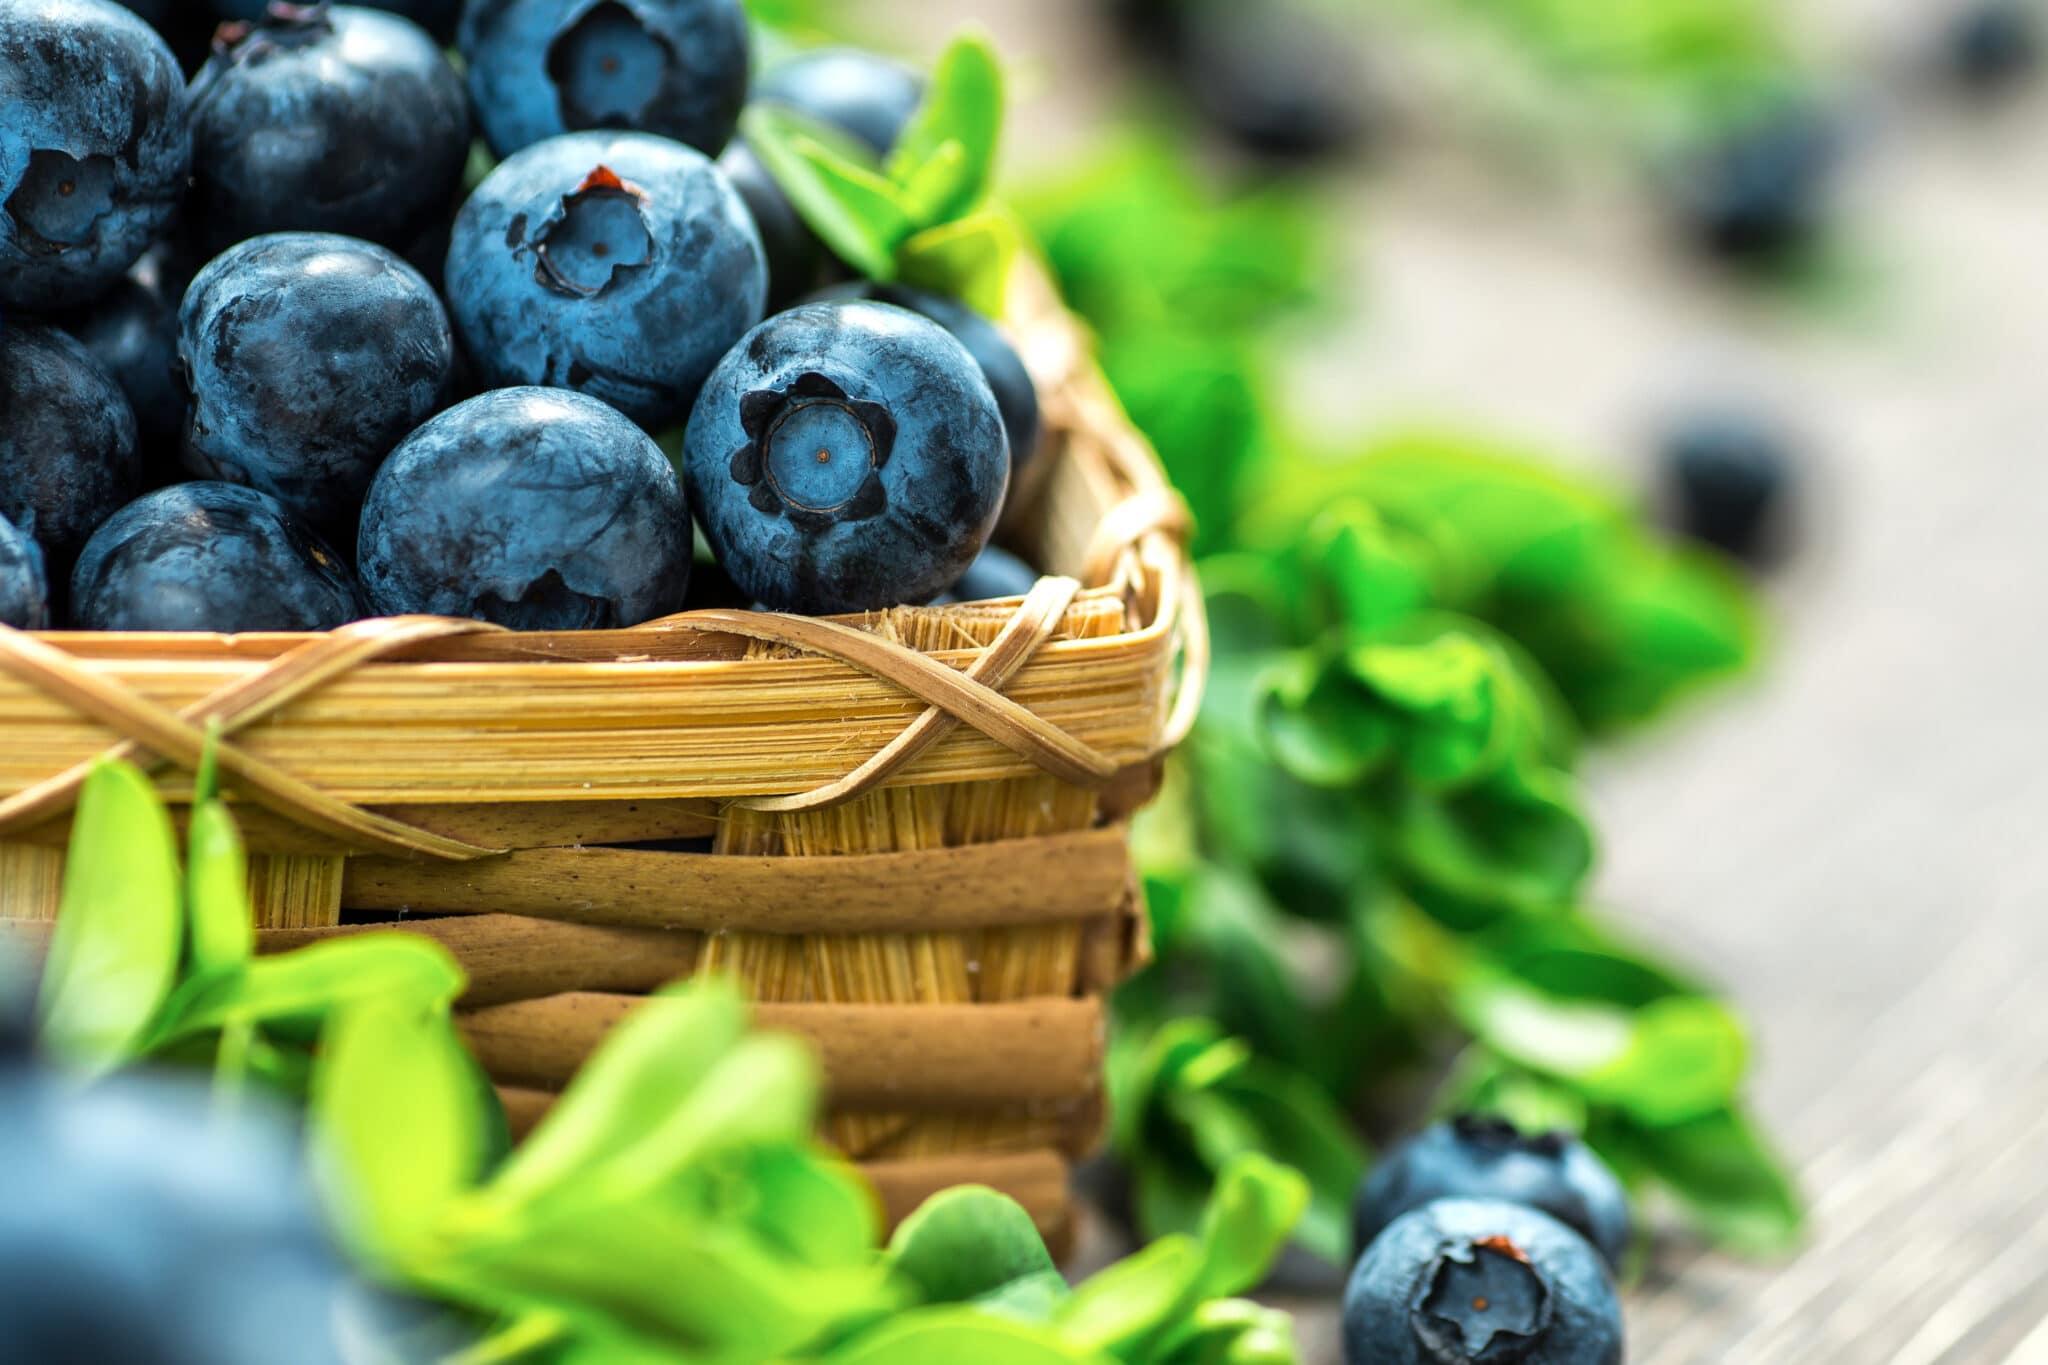 A basket of fresh ripe blueberries.